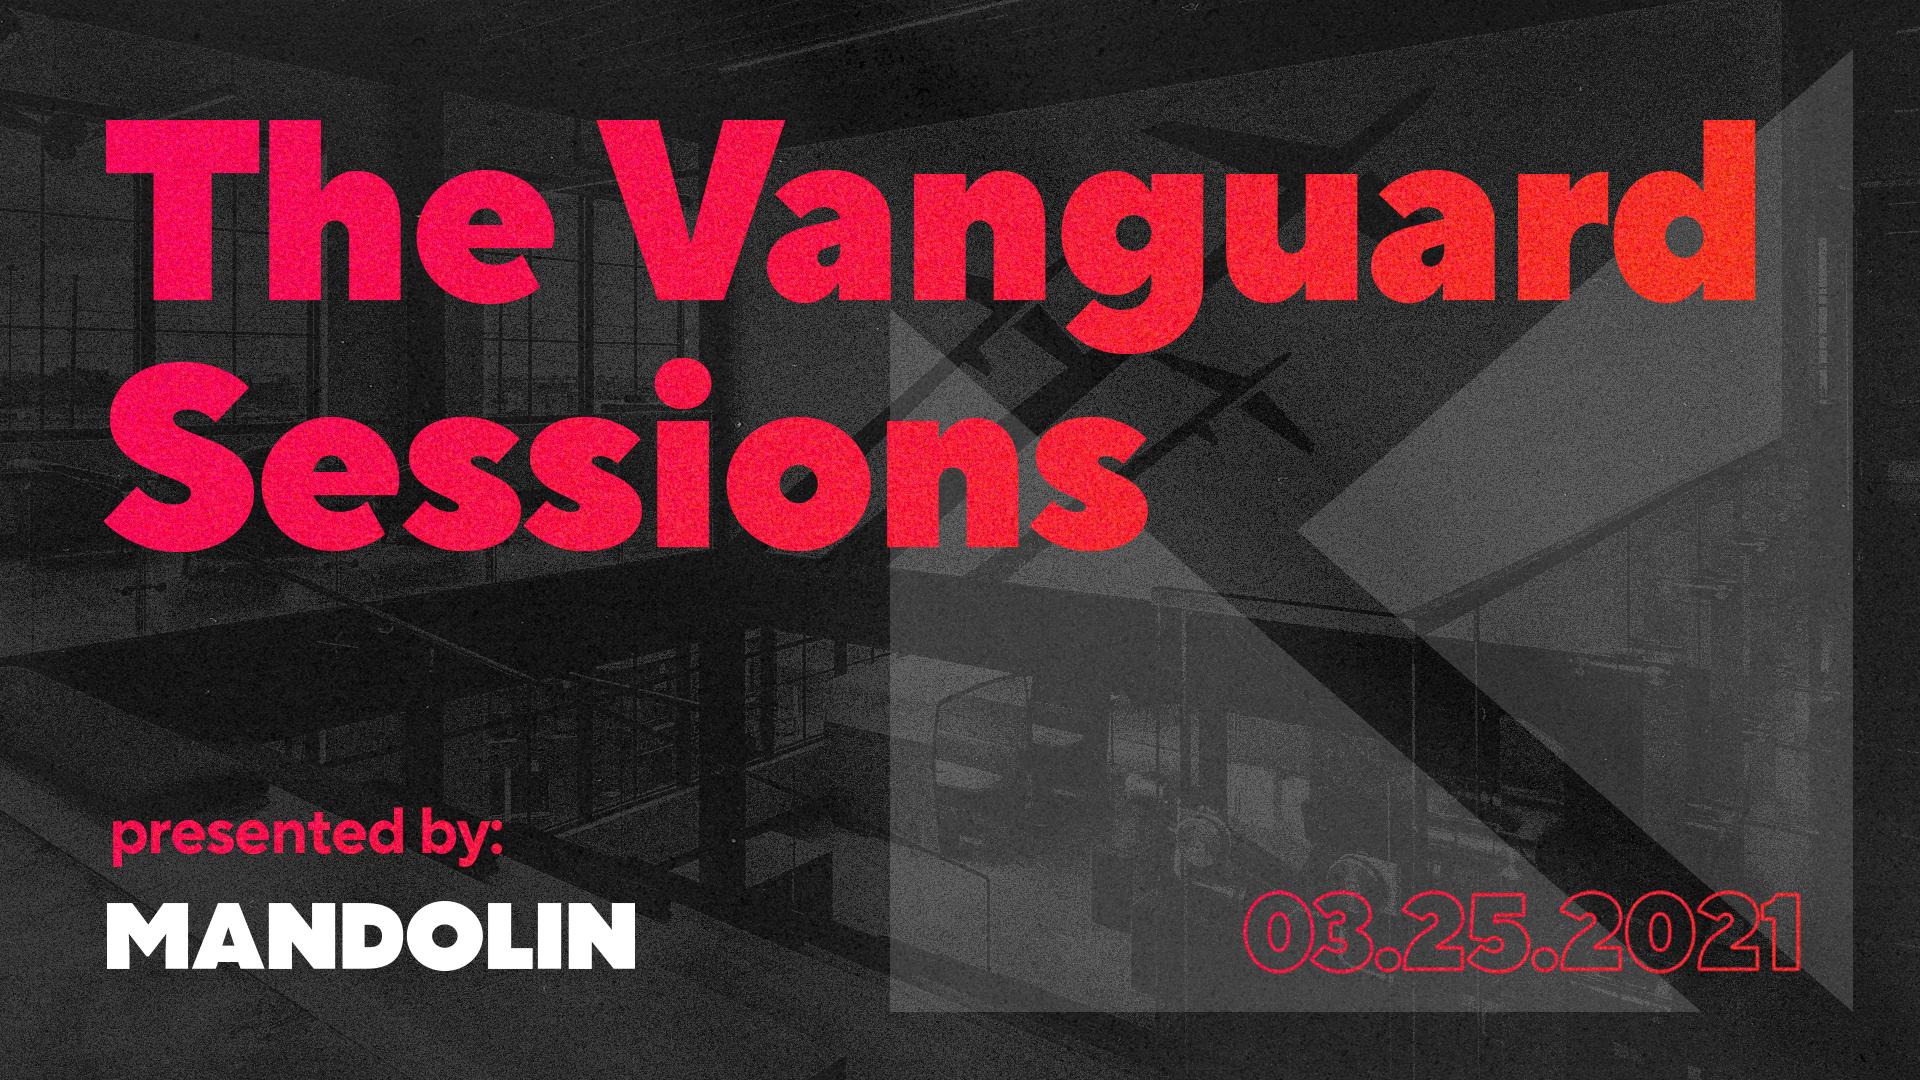 The Vanguard Sessions